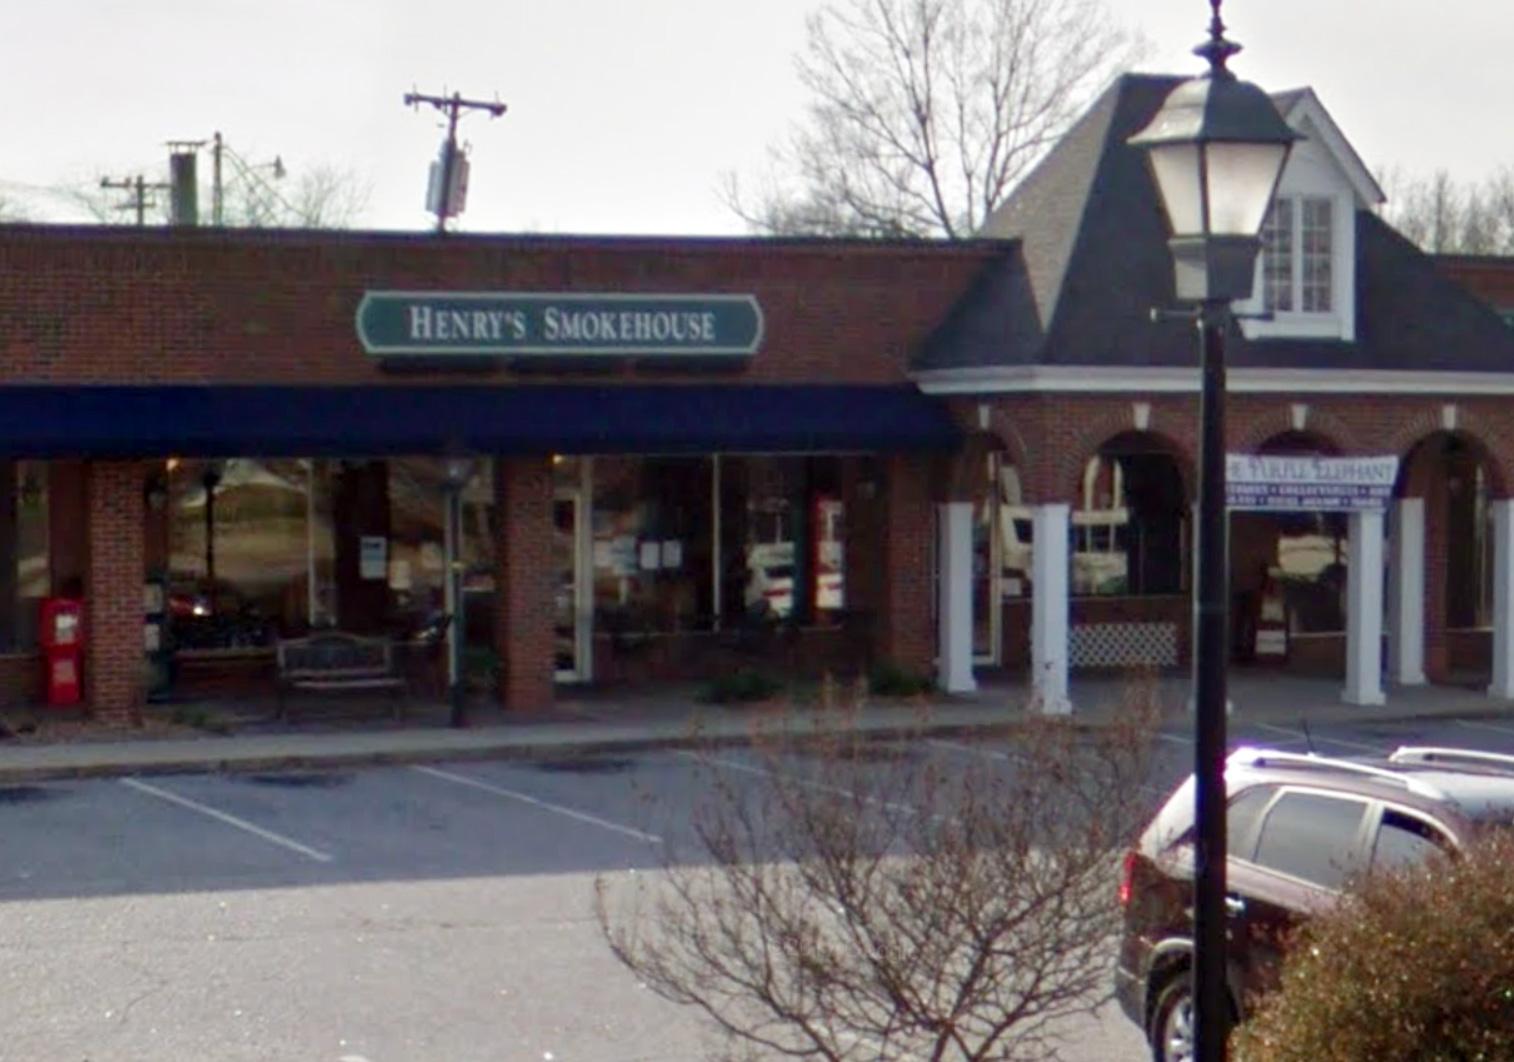 Henry's Smokehouse in Simpsonville, SC